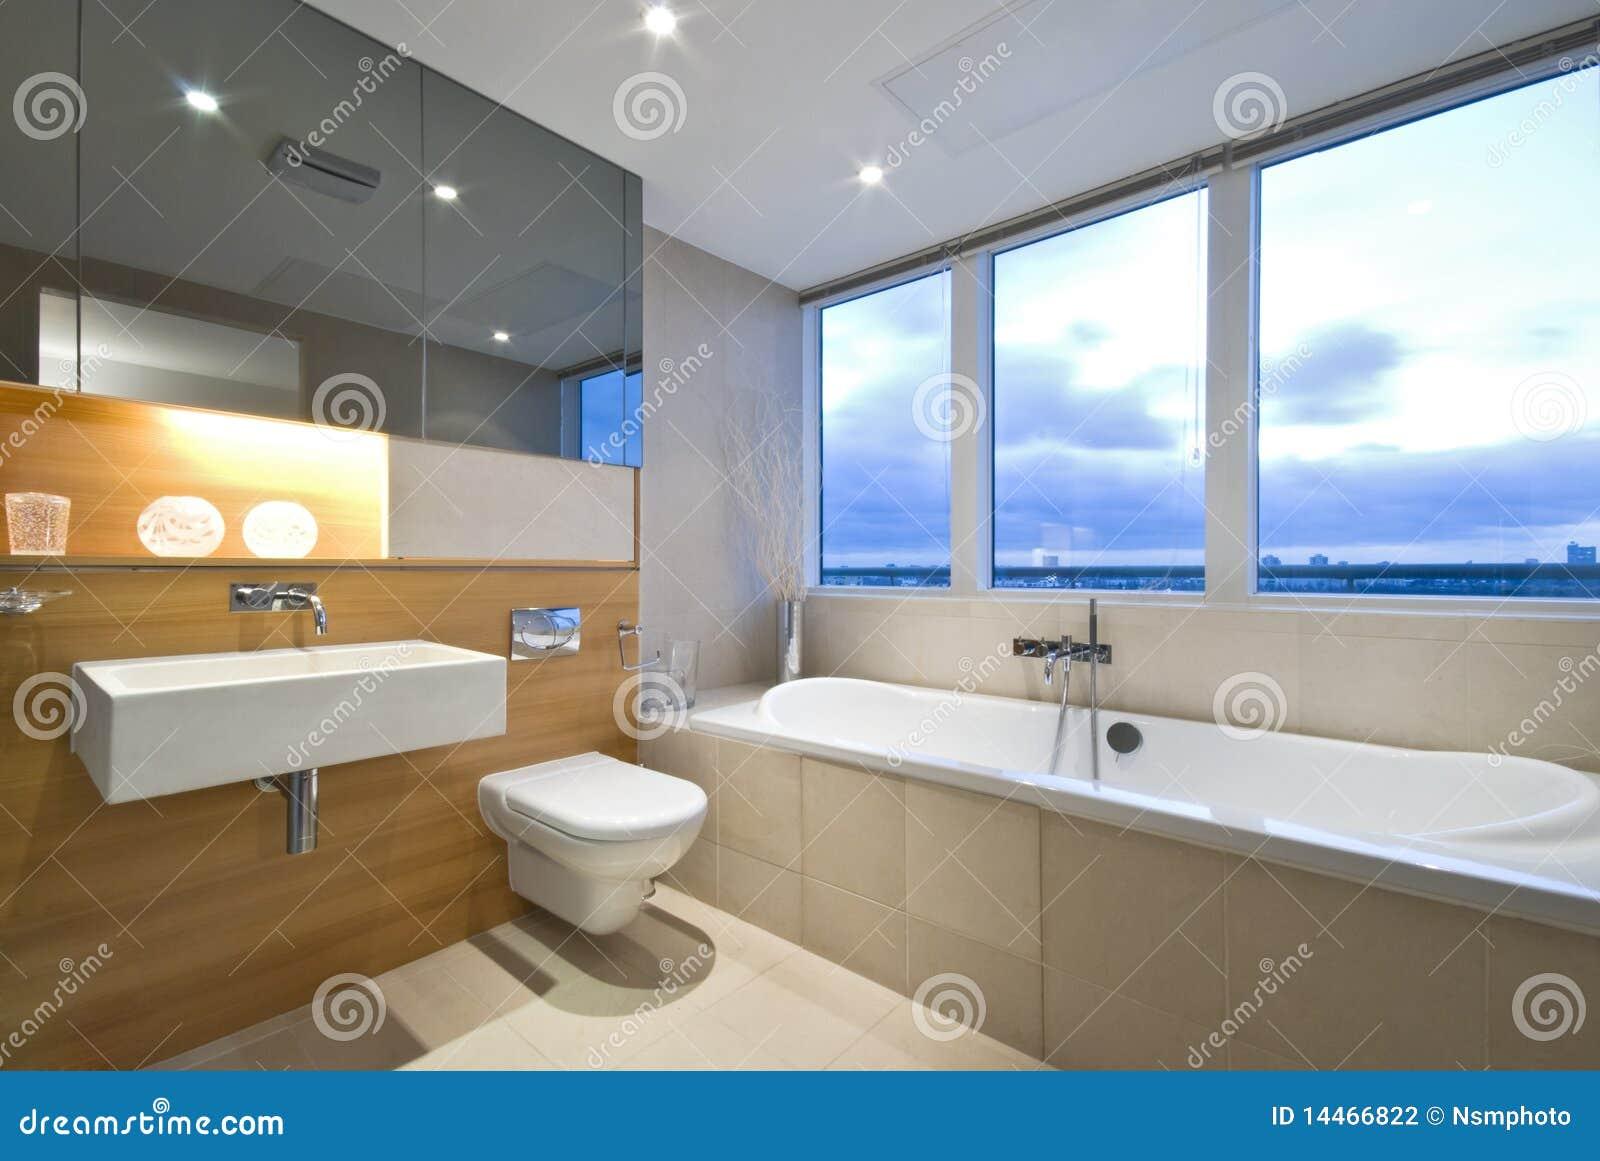 Imagenes De Baño En Tina:Modern Bathroom with Large Windows